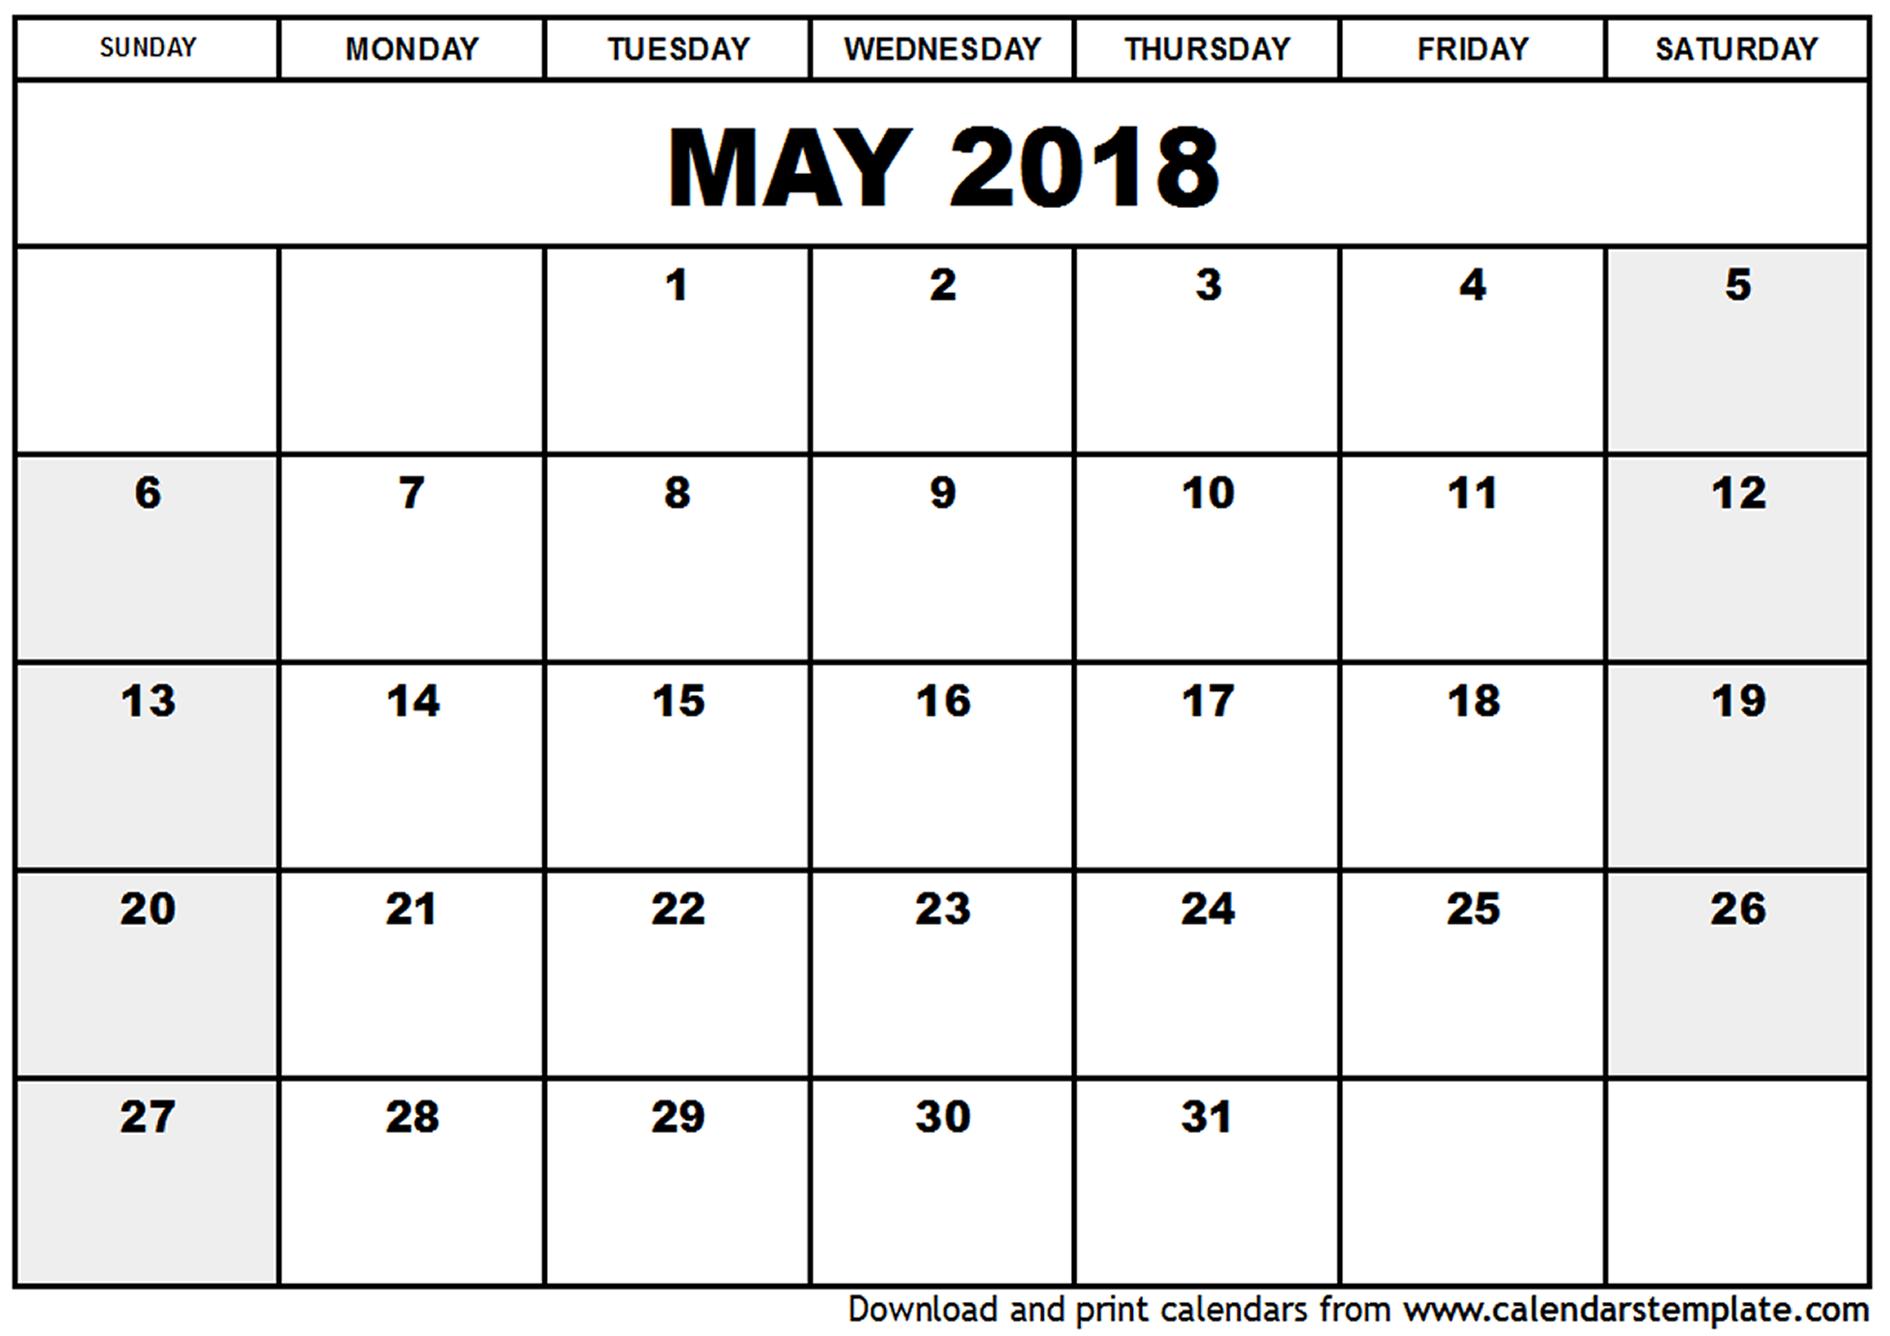 Free may 2018 calendar printable